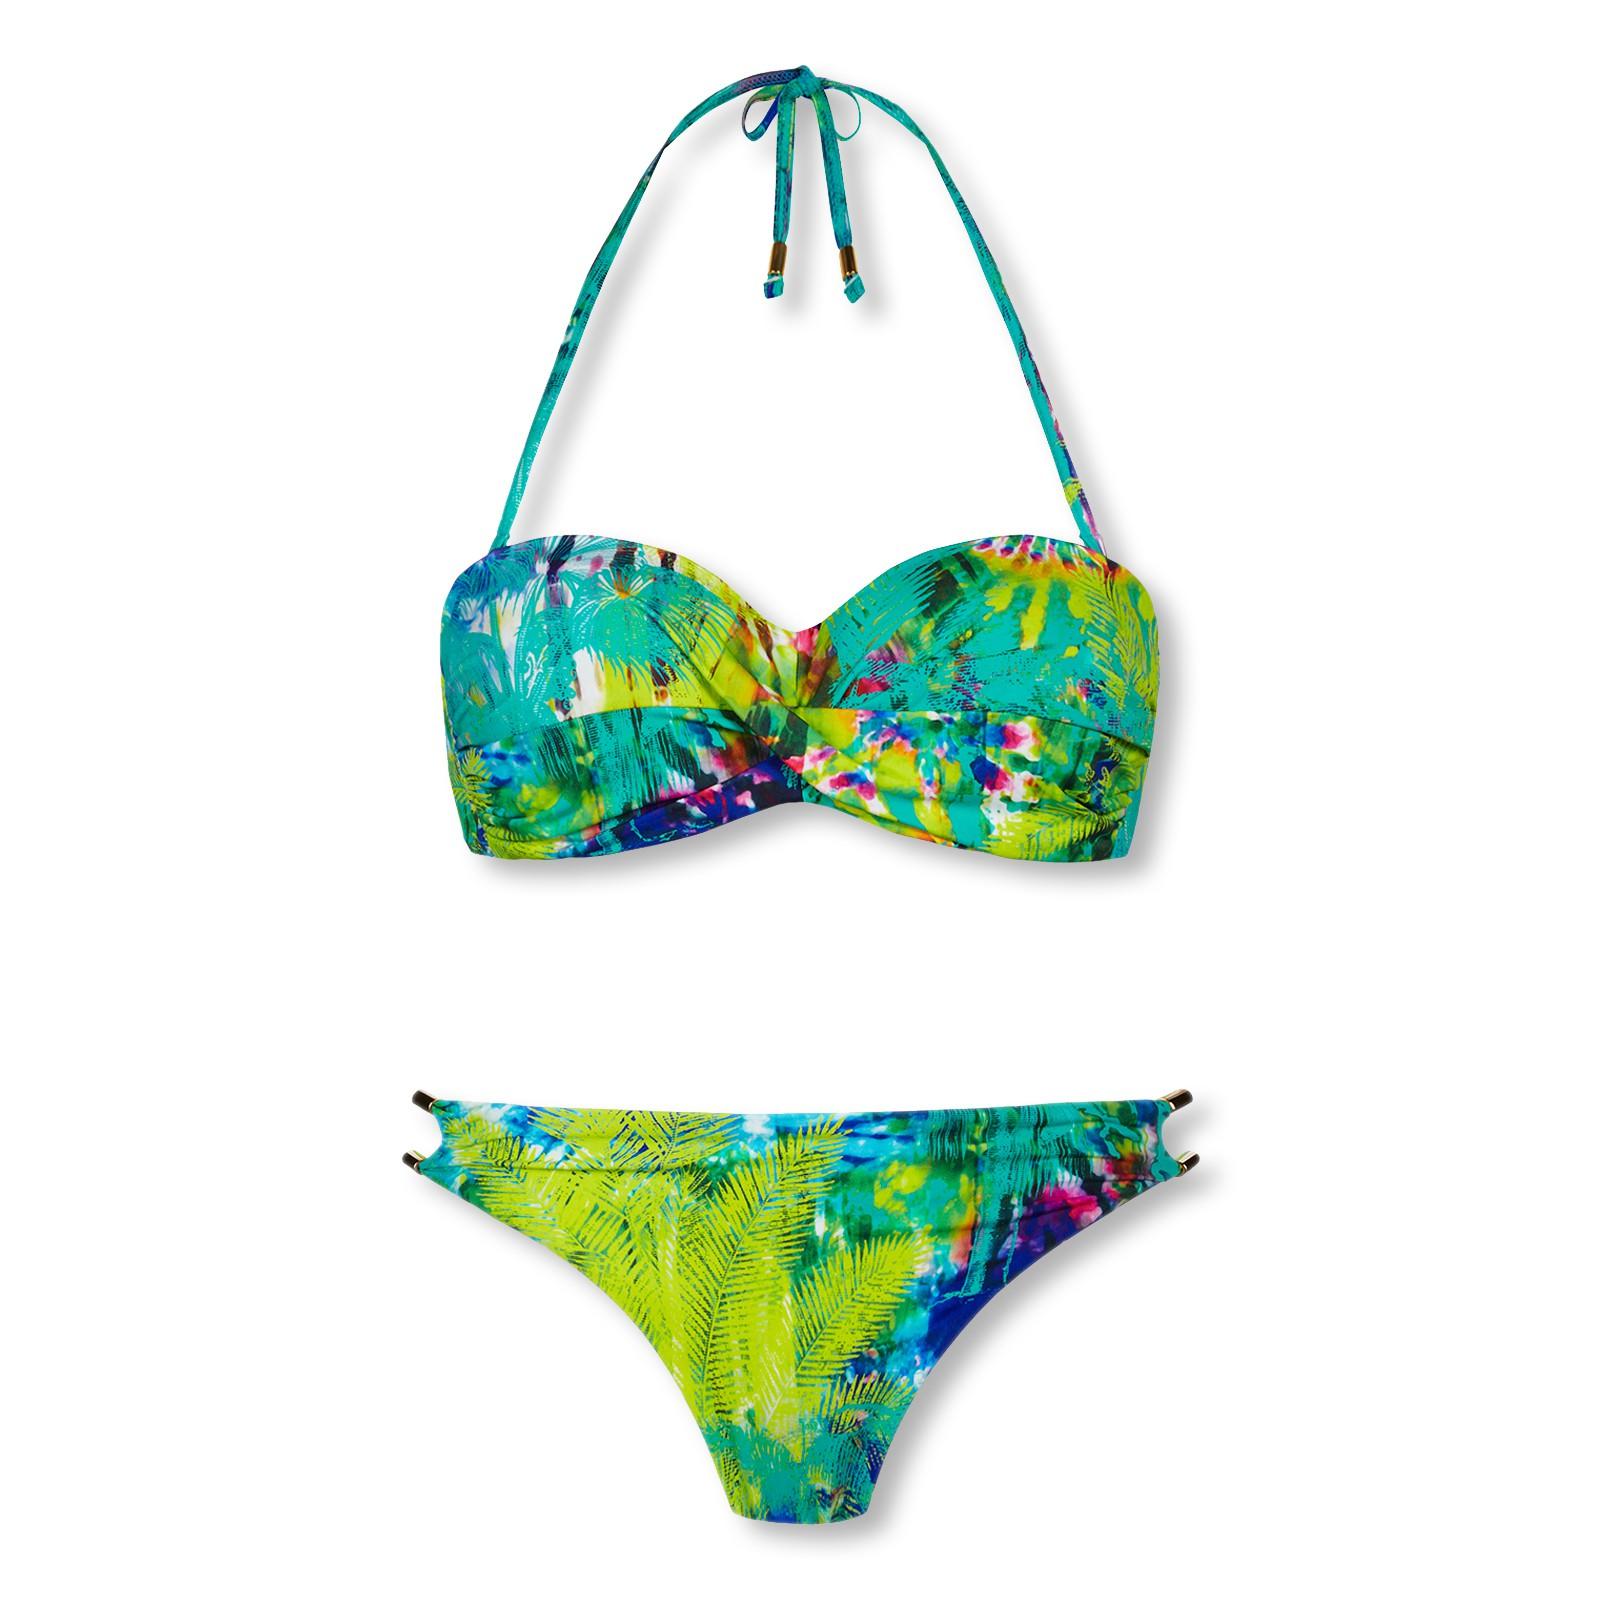 Cyell Neckholder Bügel Bikini Set Thyrsa Venice in 36/S 38/M 40/L 42/XL